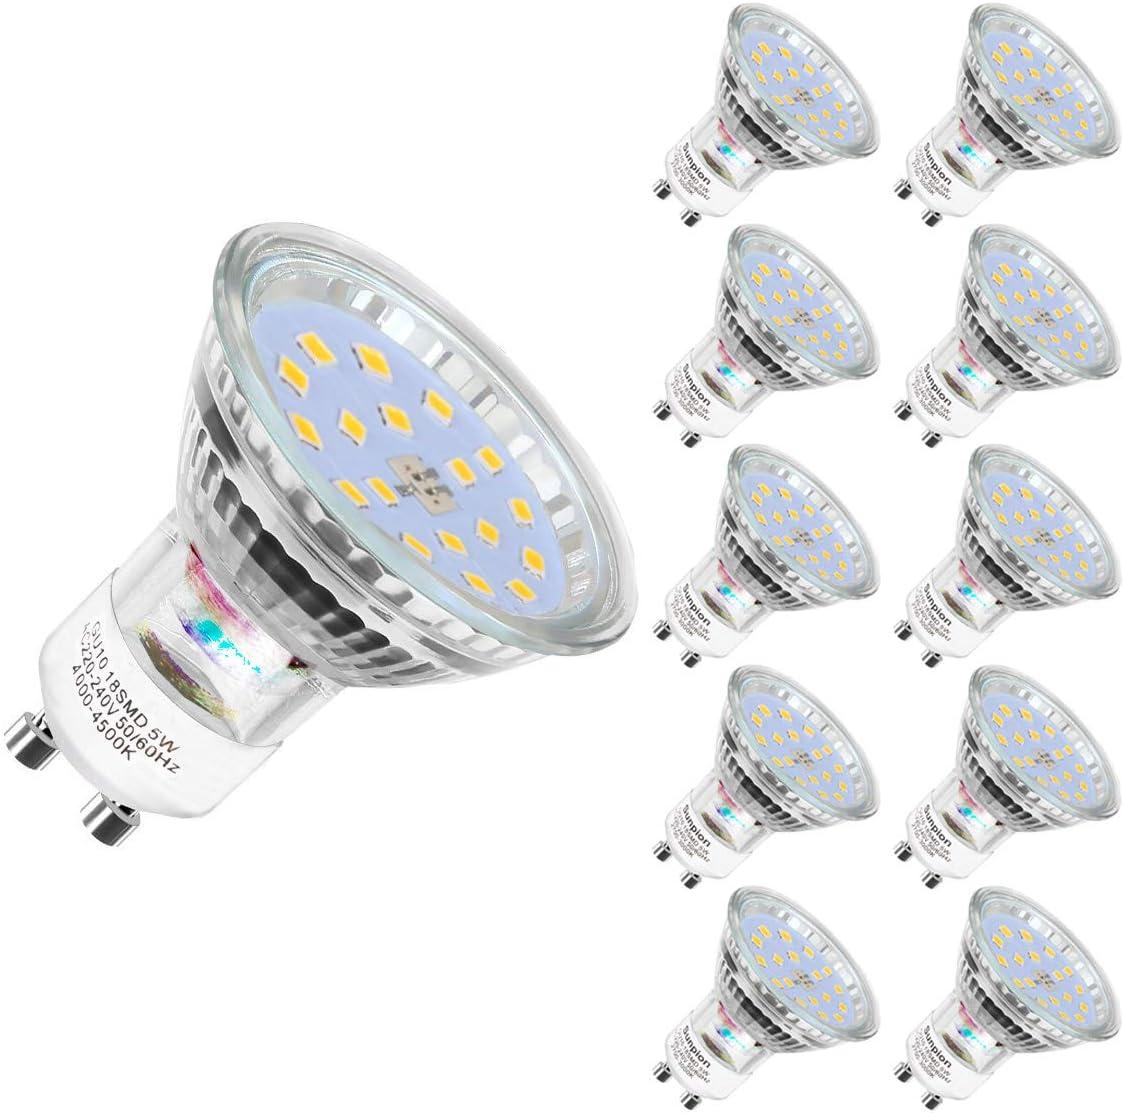 Bombilla LED GU10, luz blanca neutra, GU10, luz blanca neutra, 4500 K